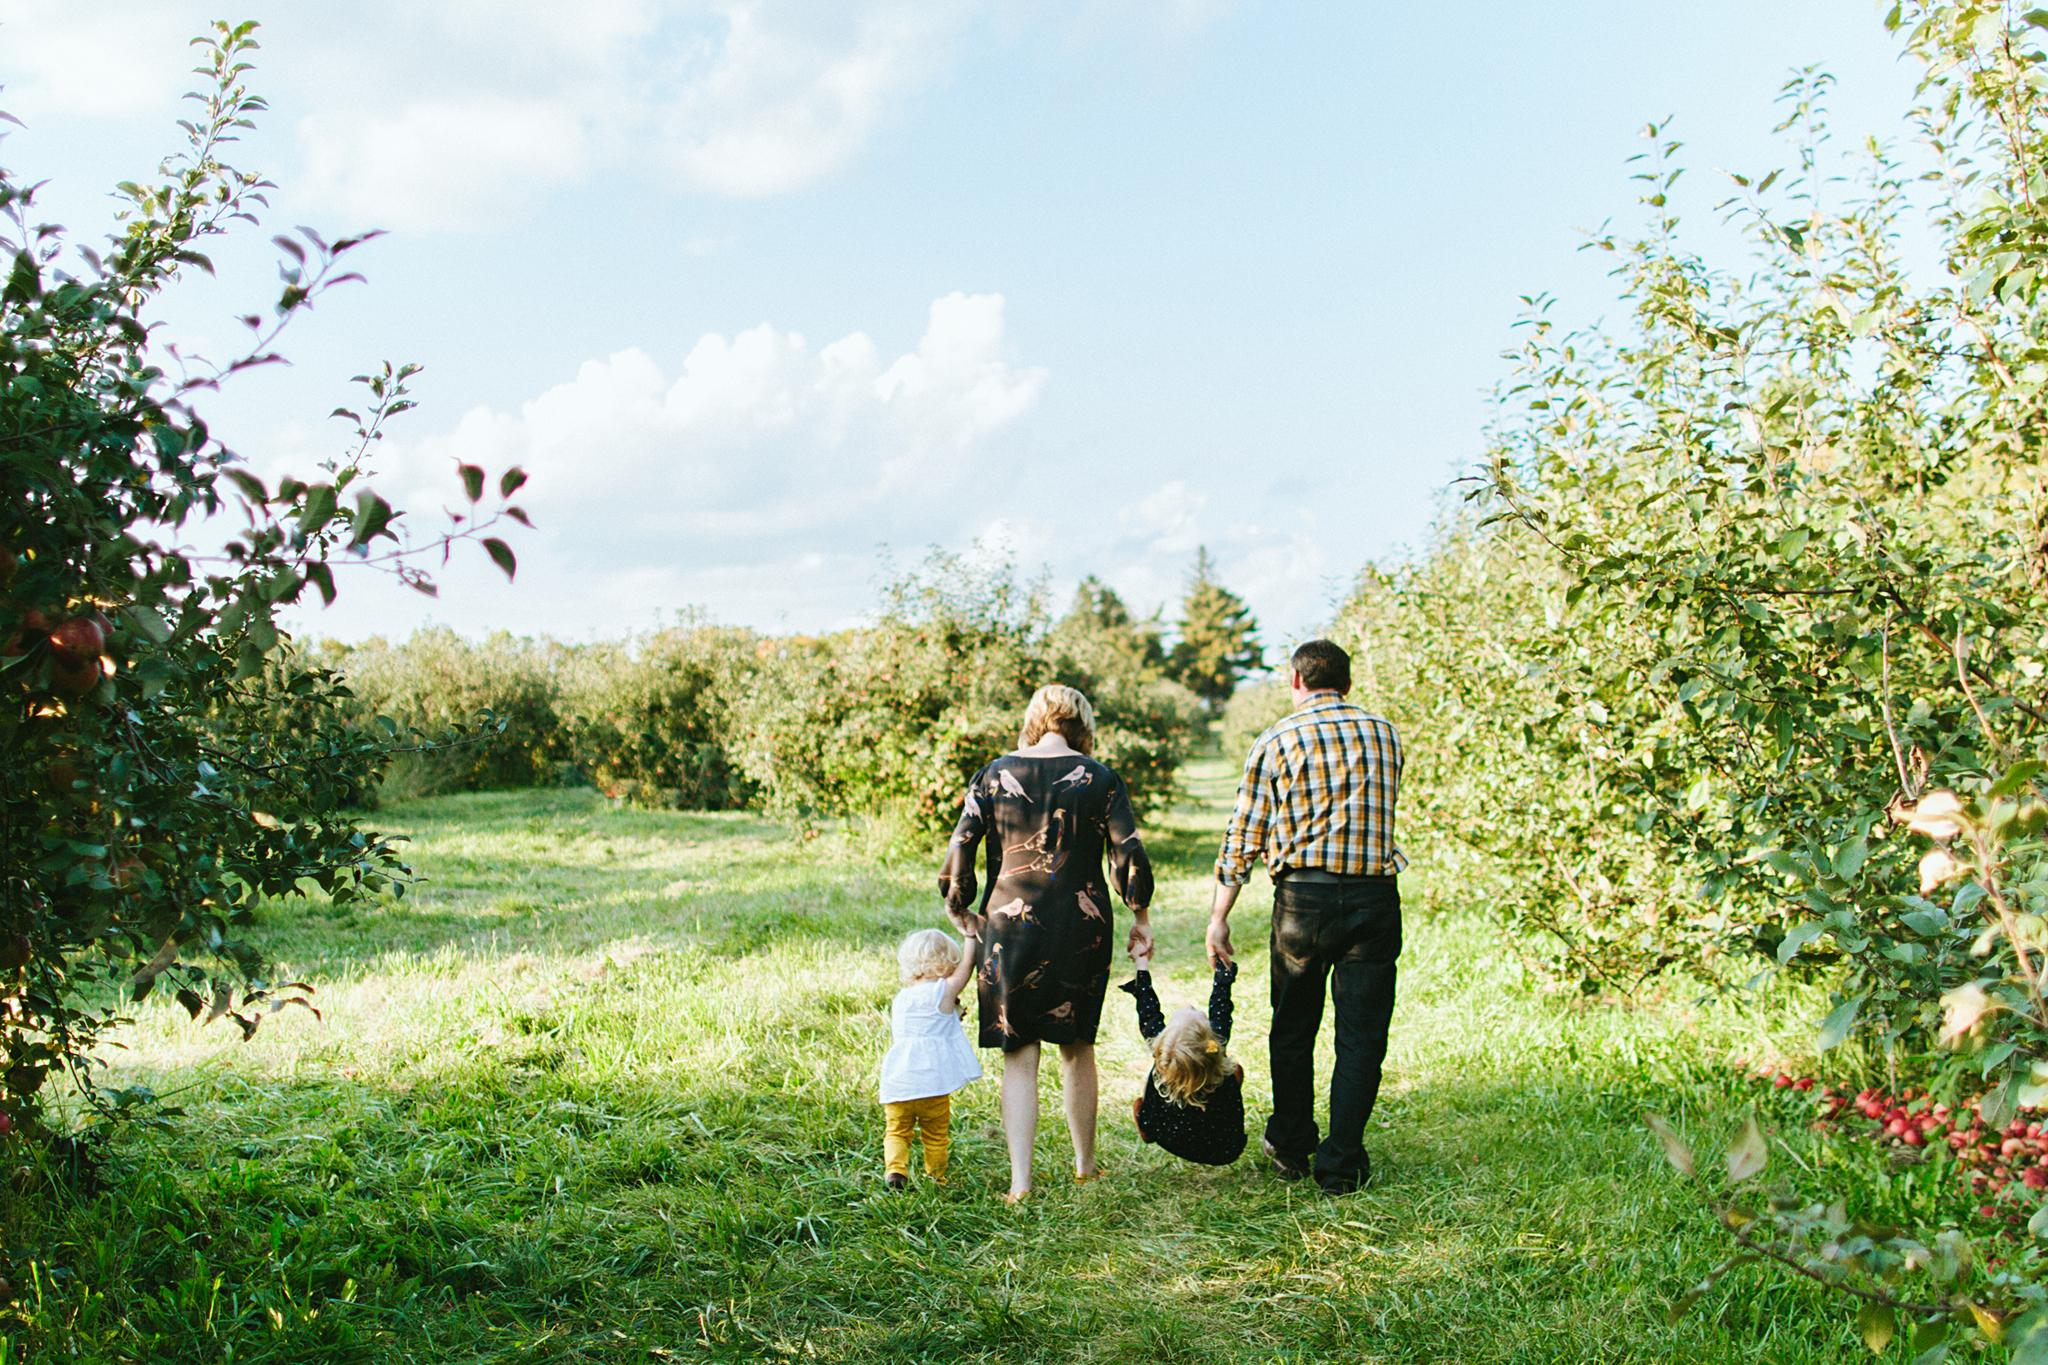 Skagit Valley Orchard Family Photos